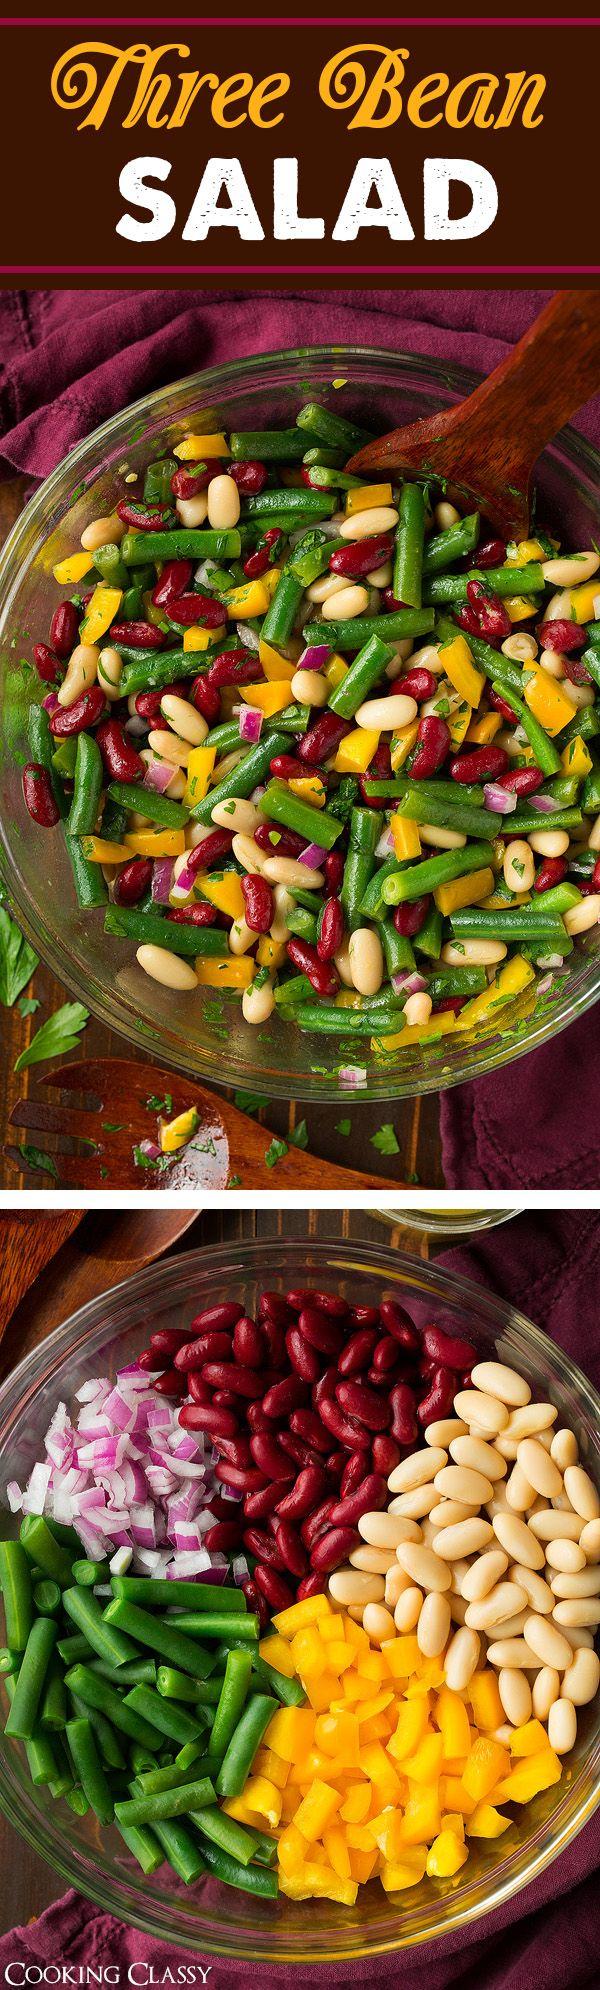 Three Bean Salad | Cooking Classy